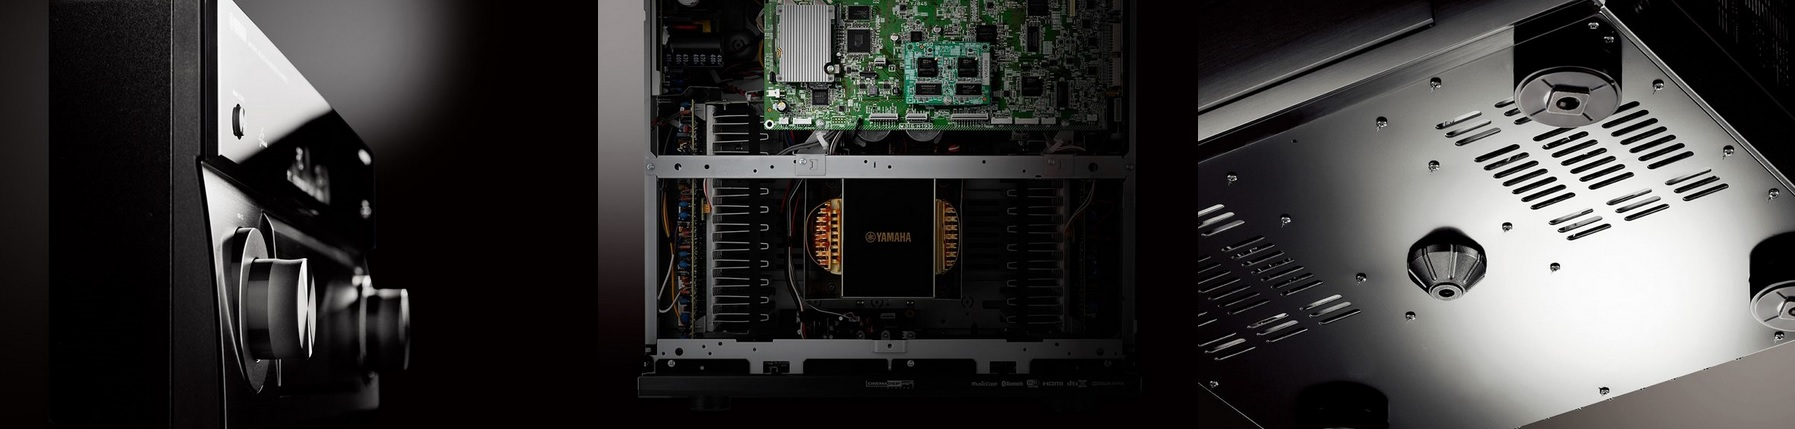 Yamaha AVENTAGE RX-A2080, ART Wedge et DAC ESS SABRE Premium